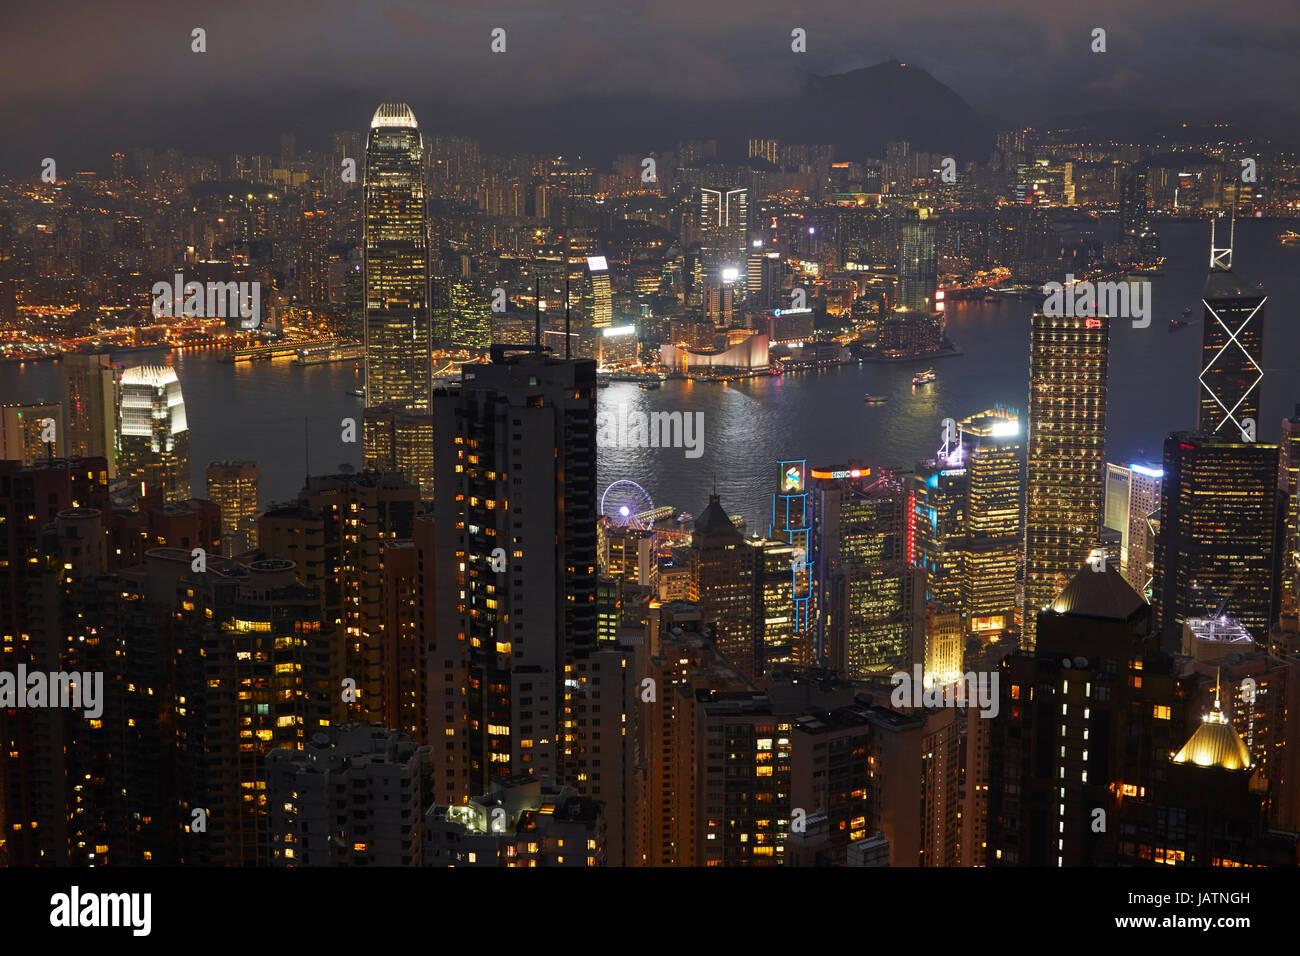 Blick auf Kowloon, Victoria Harbour und zentral, vom Victoria Peak, Hong Kong Island, Hongkong, China Stockfoto